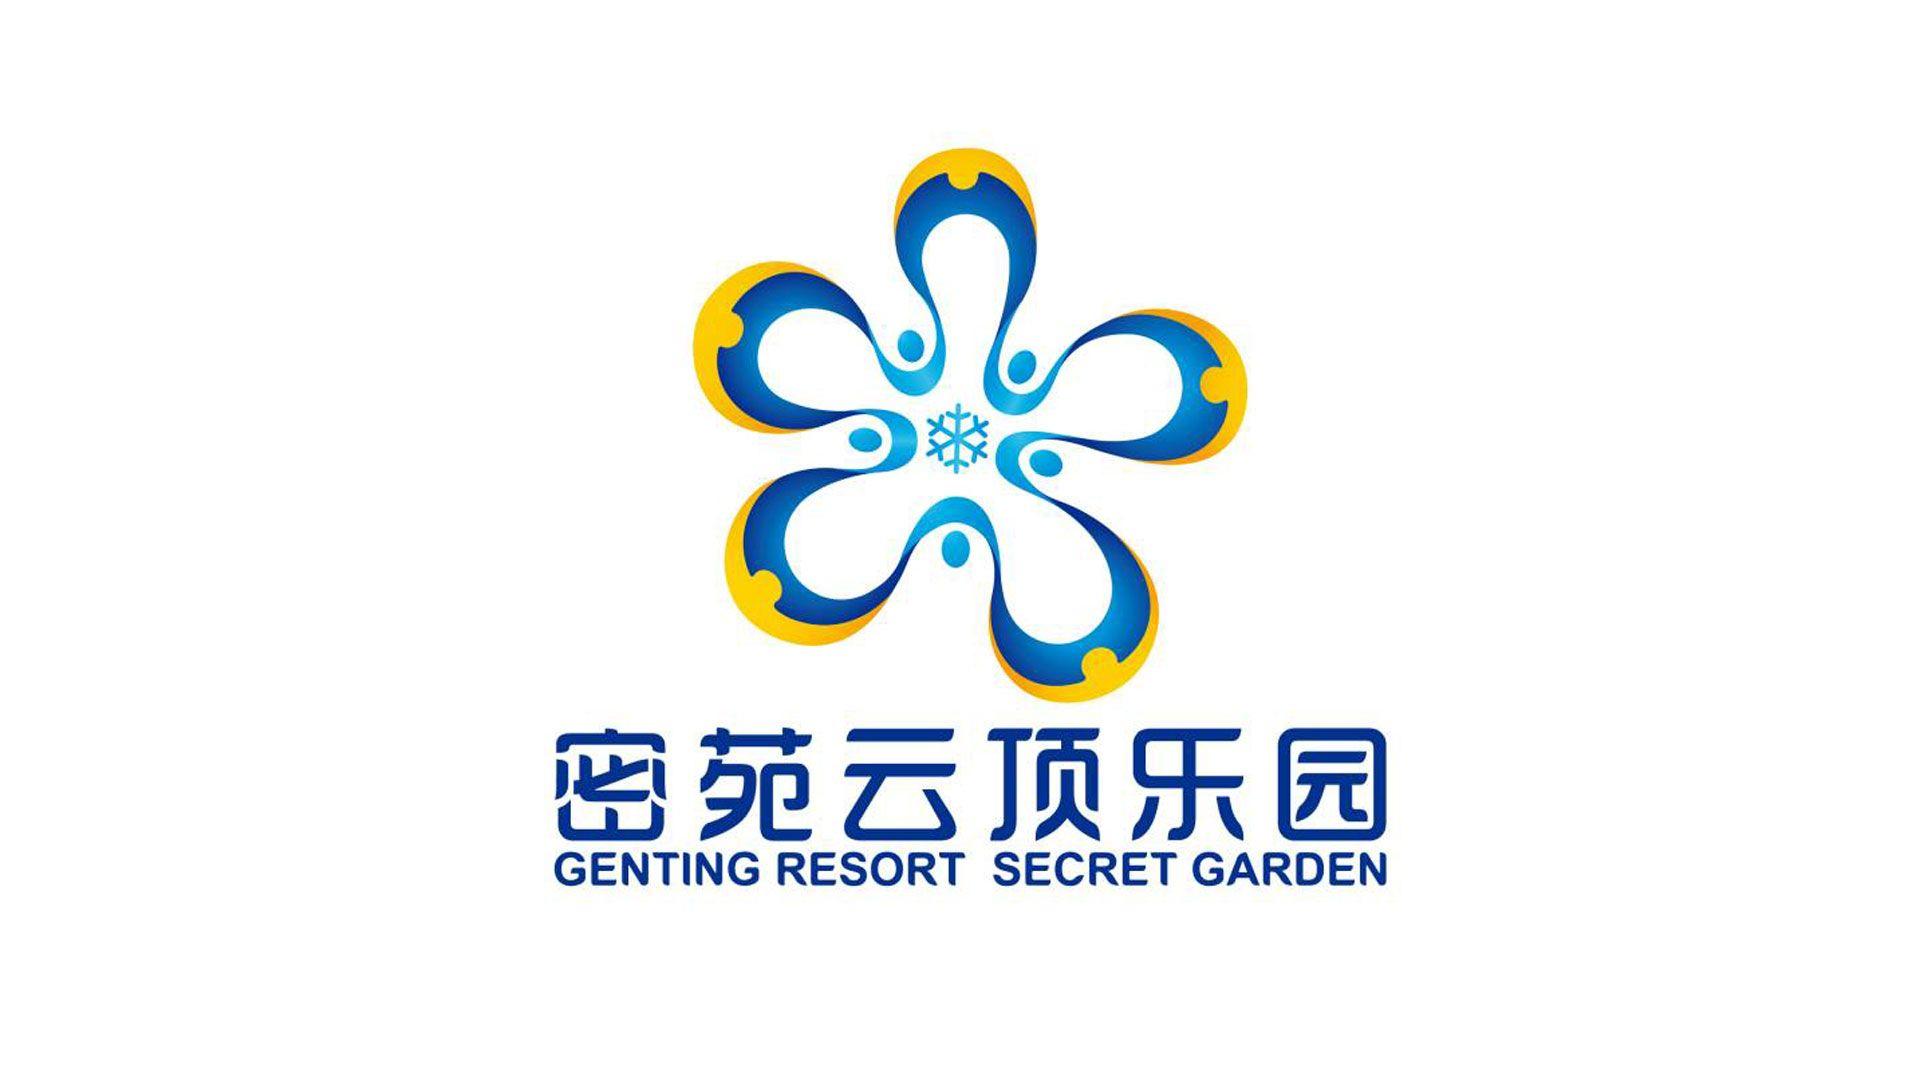 Genting Resort Secret Garden logo